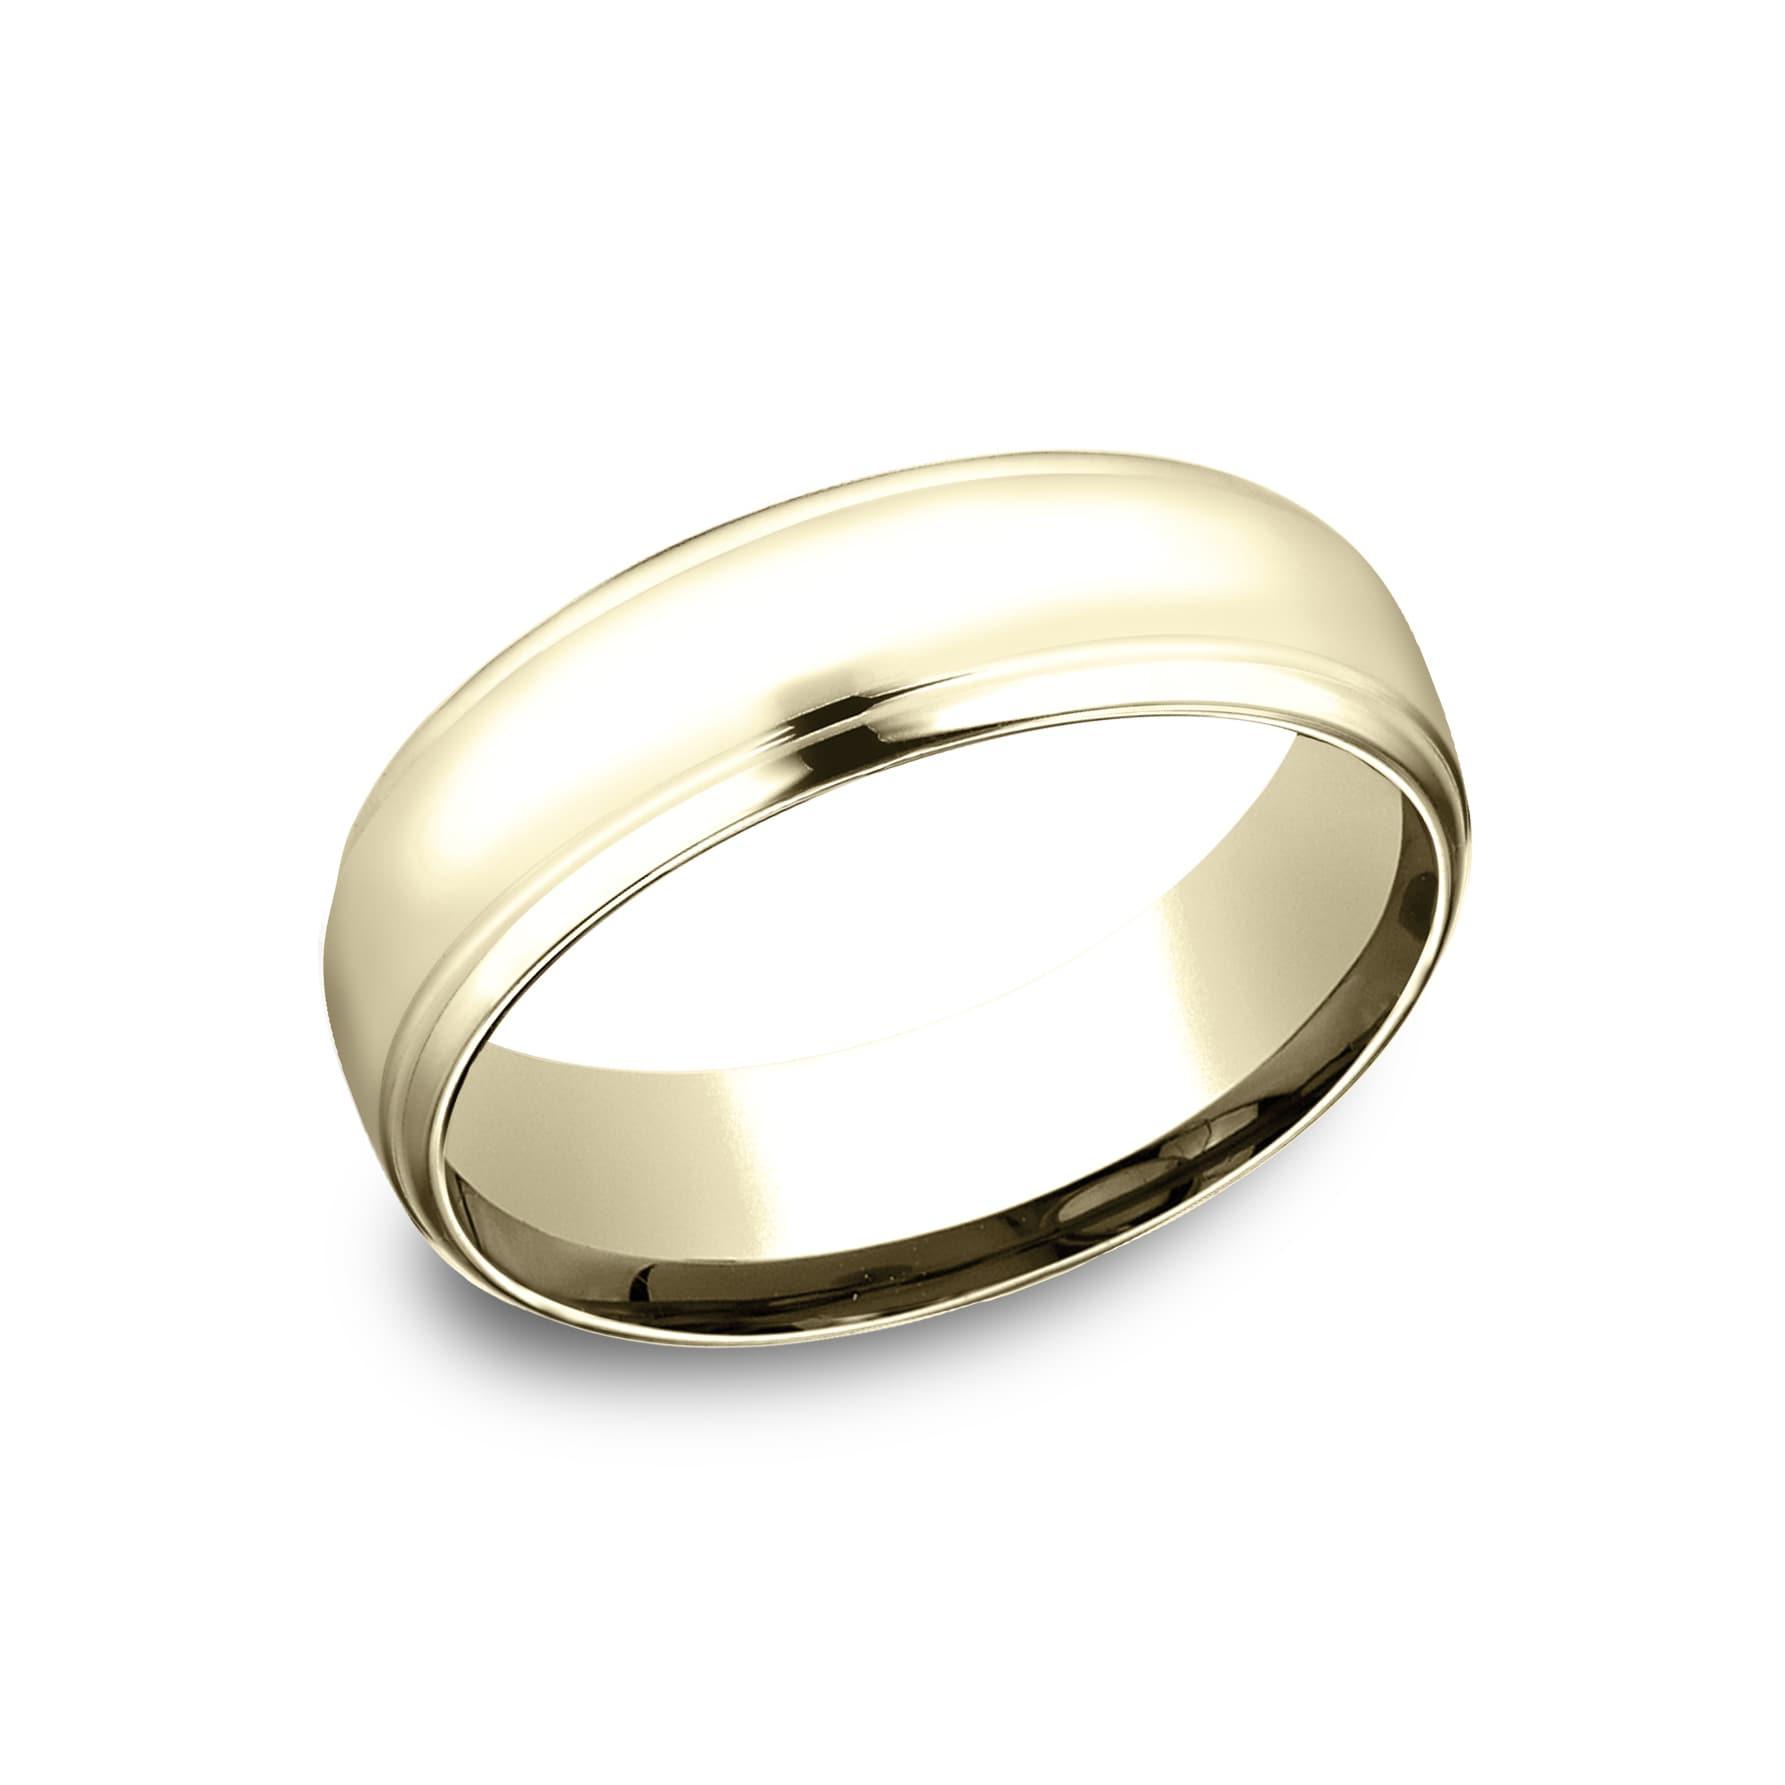 High Polish Real 14K White Gold 4mm Greek Key Huggies Snap Closure Hoop Earrings